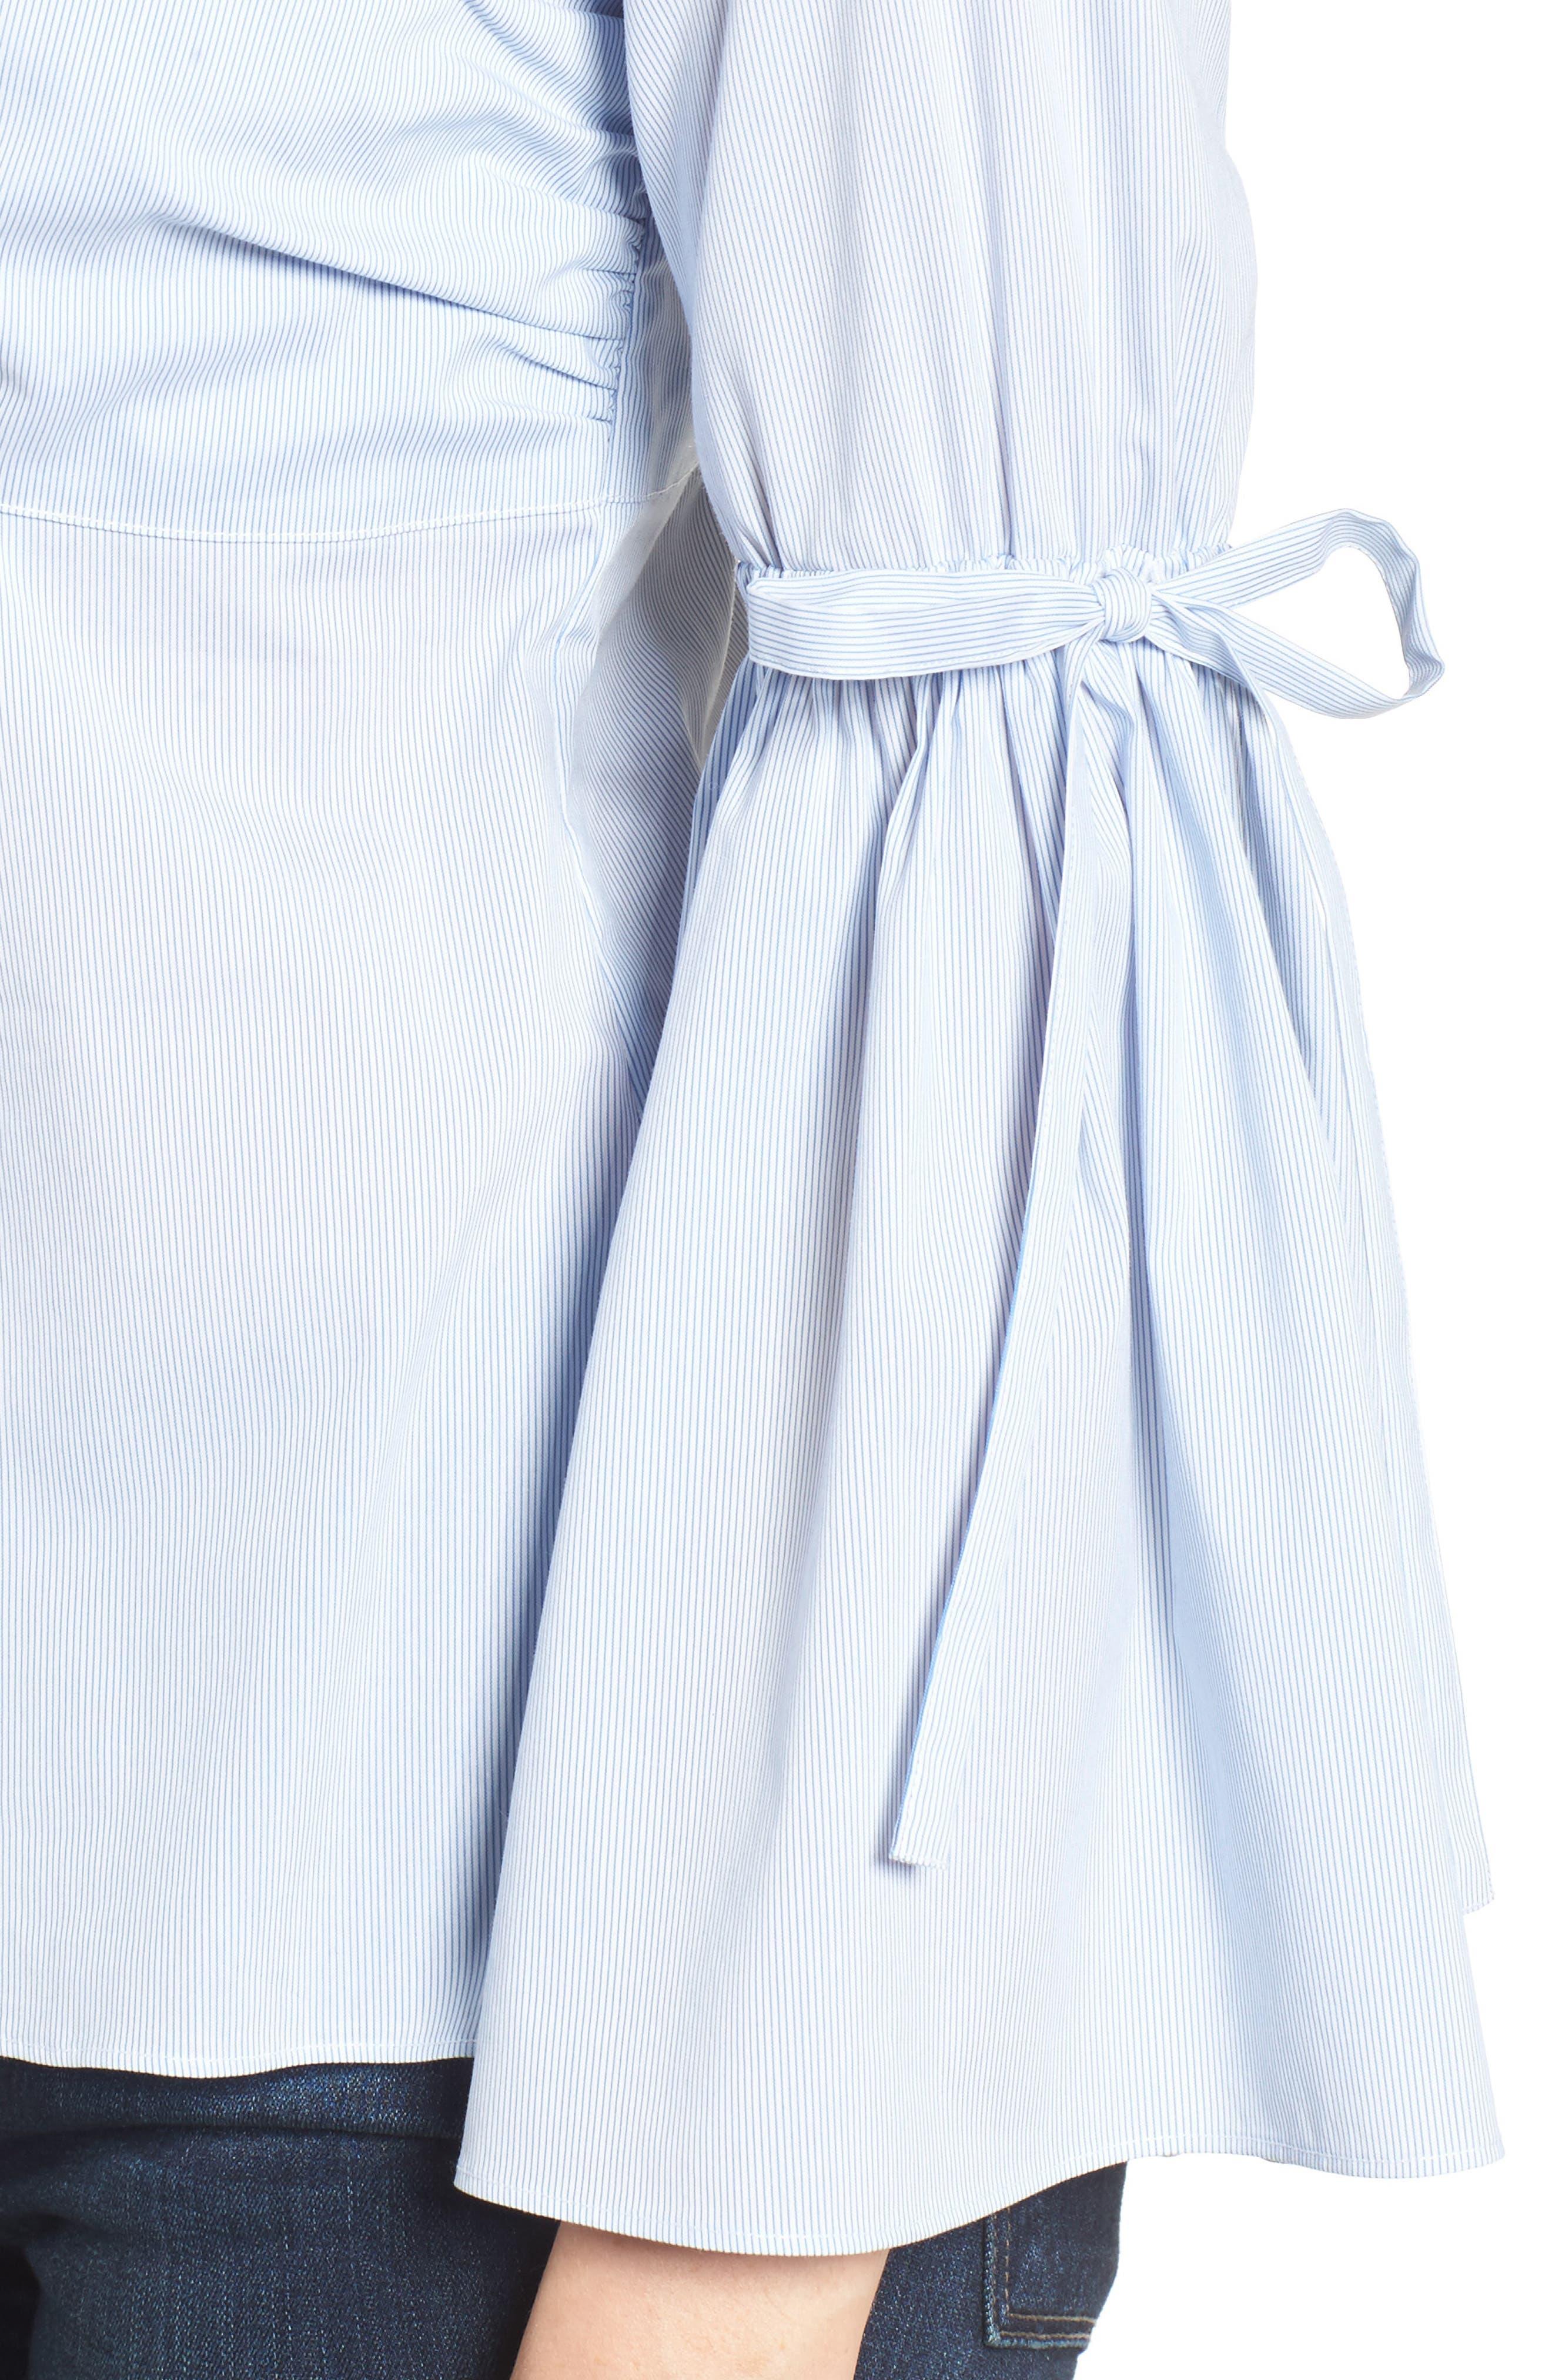 Pinstripe Poplin Blouse,                             Alternate thumbnail 5, color,                             Blue- White Pinstripe